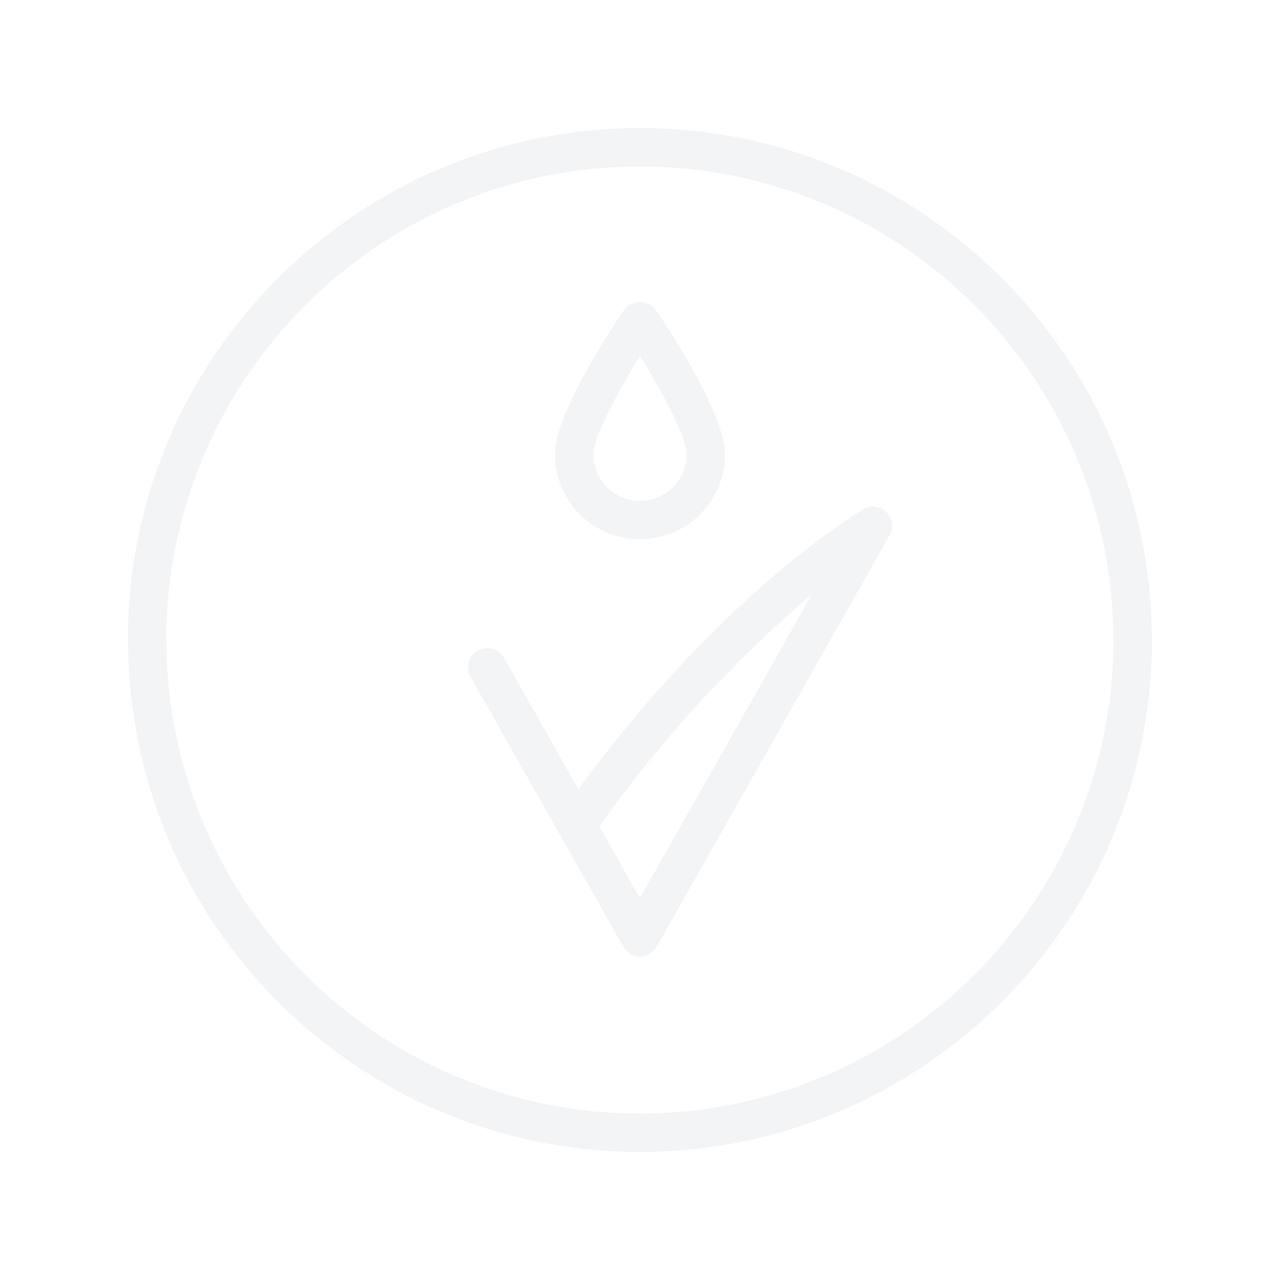 Kalahari Facial Cleanser 160ml